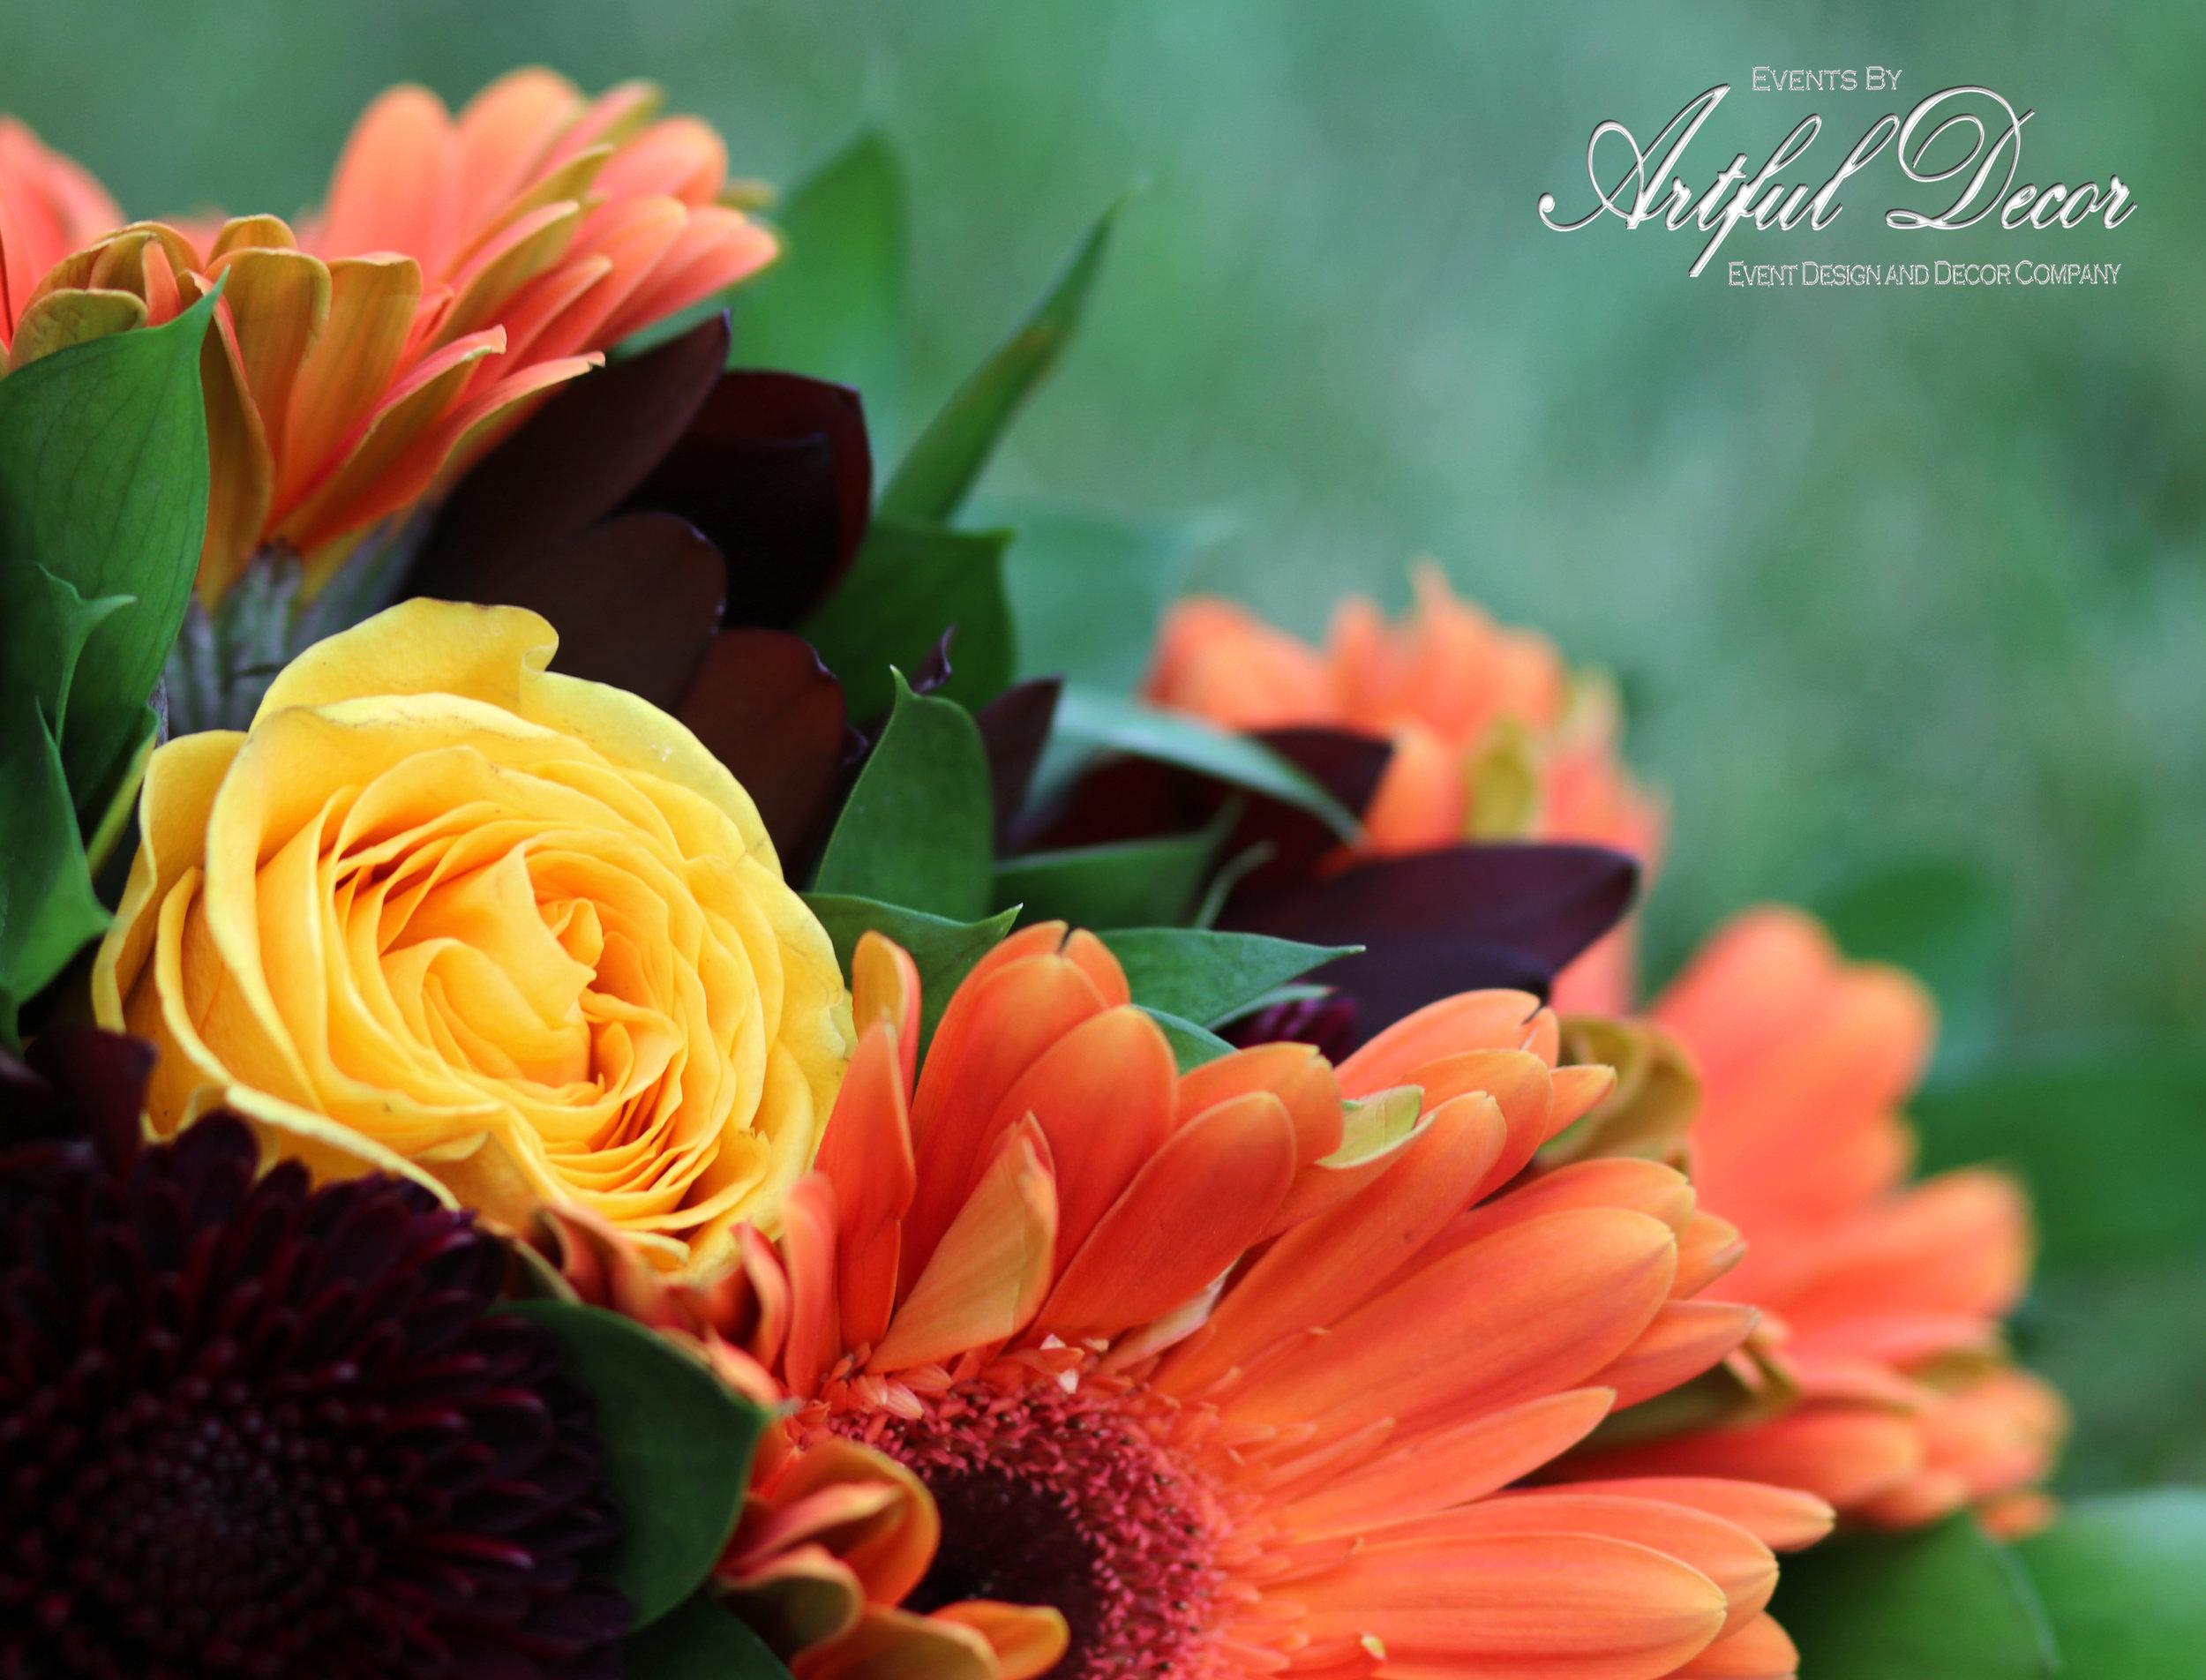 Bouquet 8 Crop 2 Copyright.jpg